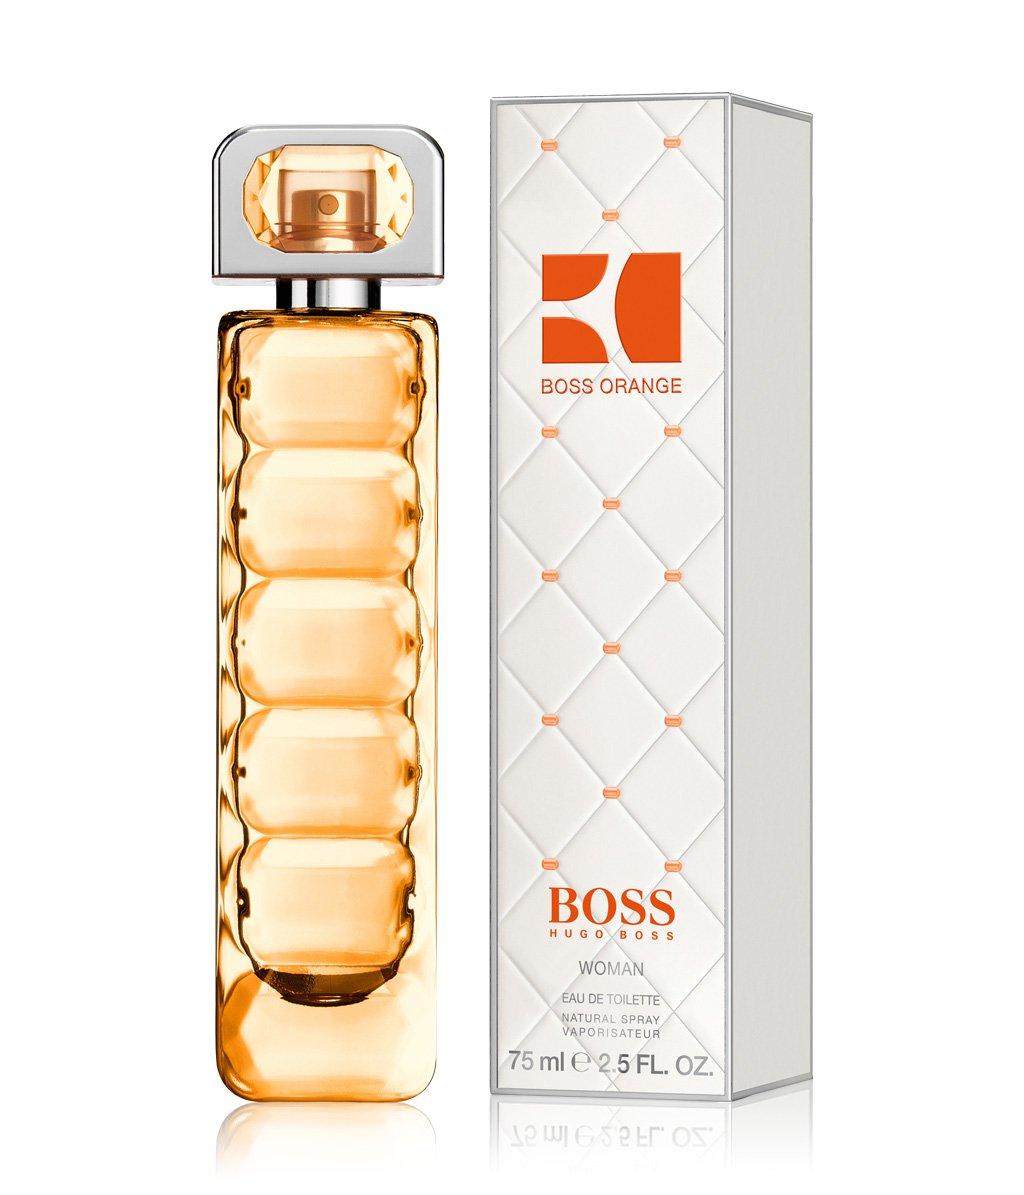 hugo boss orange woman eau de toilette bestellen flaconi. Black Bedroom Furniture Sets. Home Design Ideas